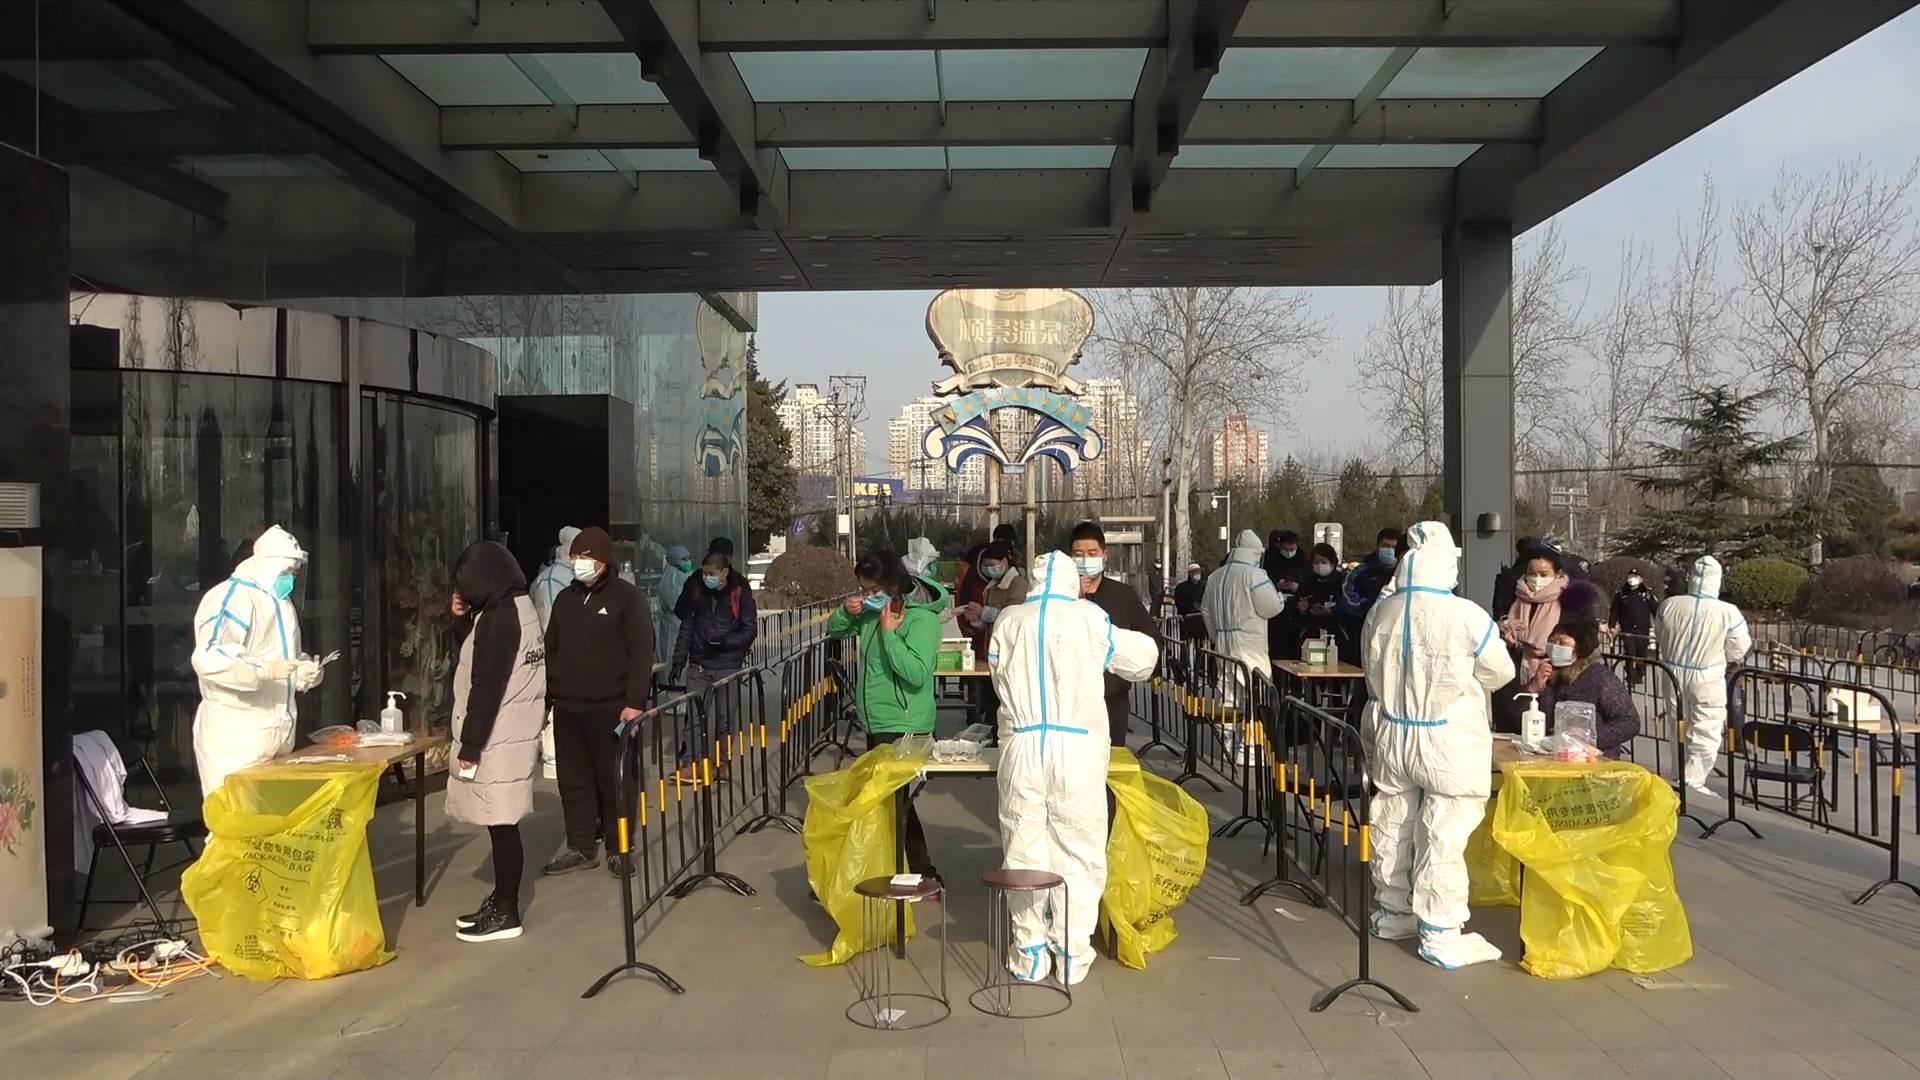 Beijing tightens epidemic prevention measures, further testing underway